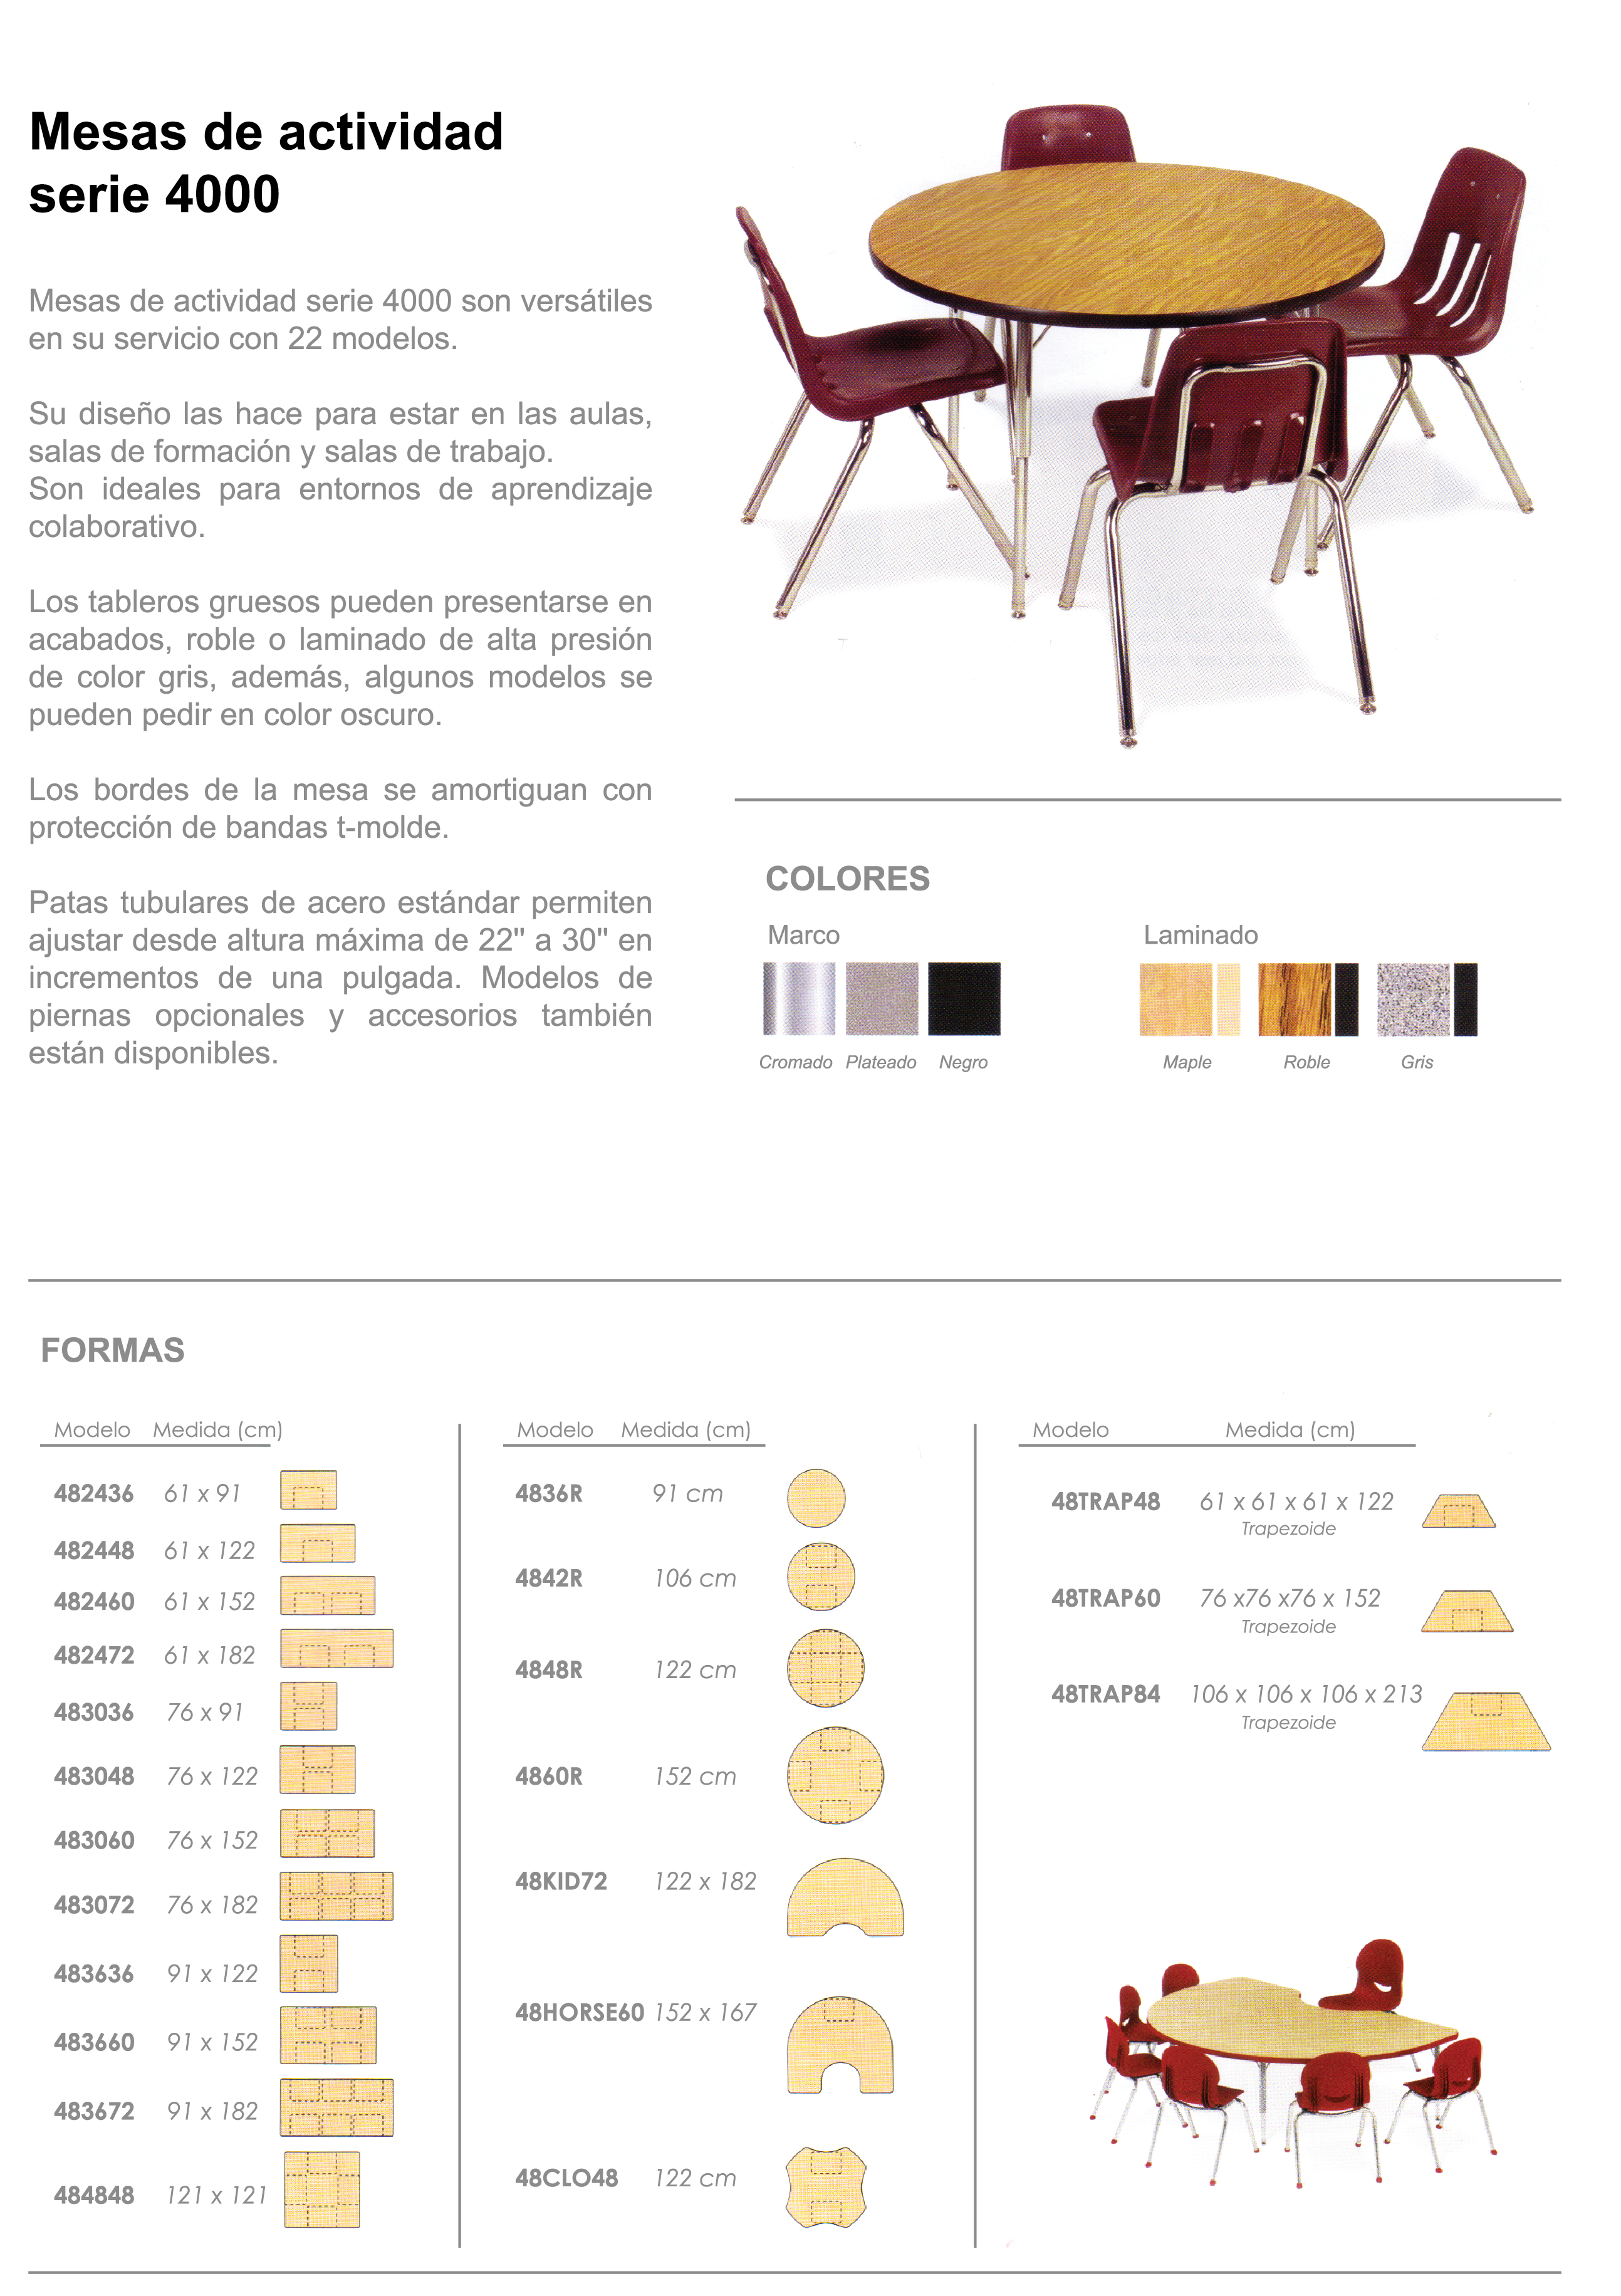 Euromuebles By Loft Muebles Educativos # Muebles Educativos